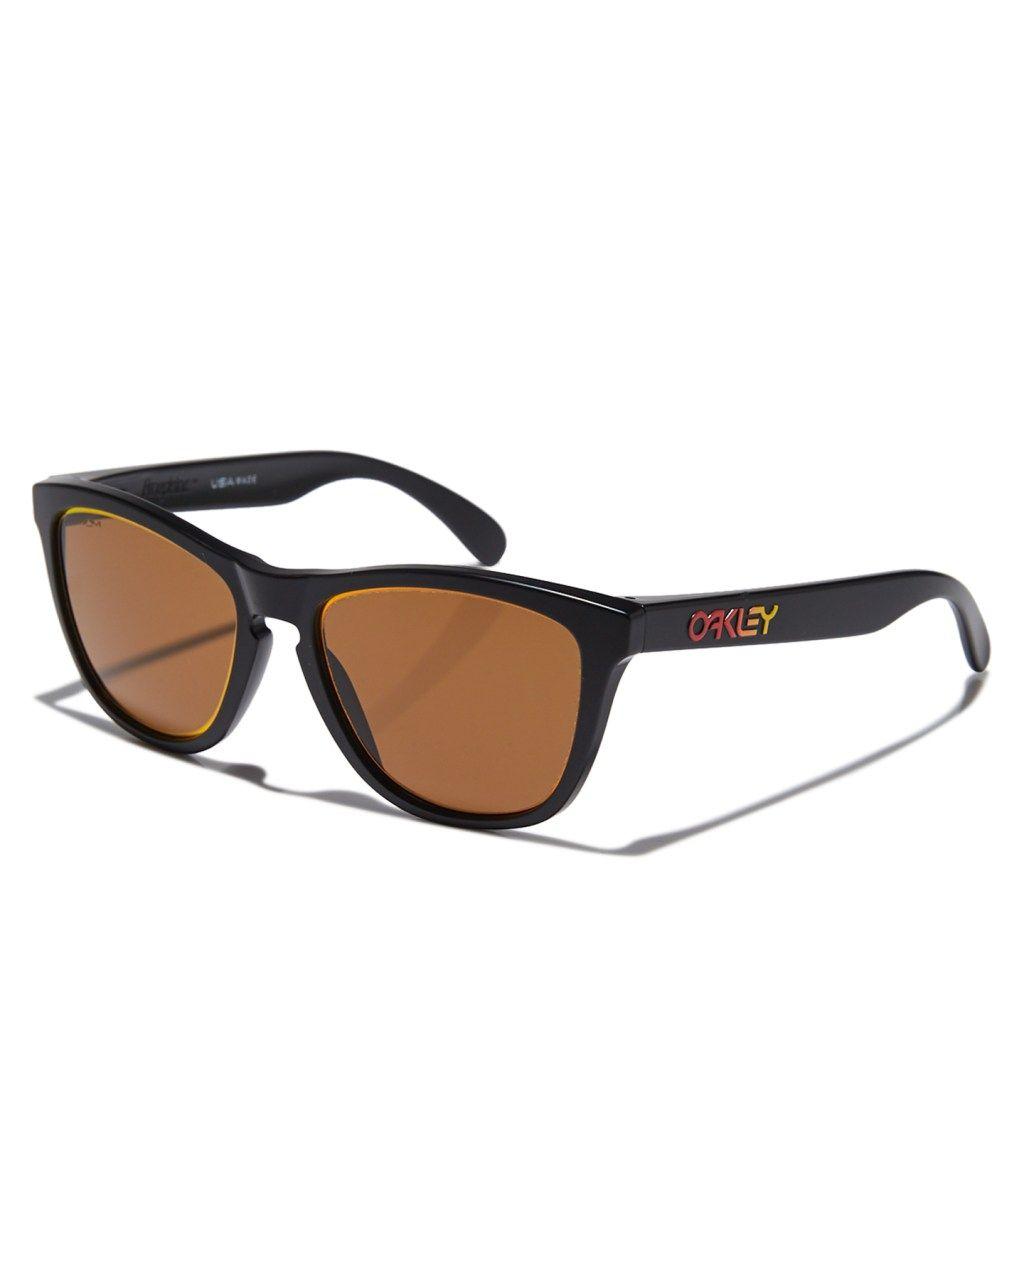 1668171c116 Oakley Frogskins Sunglasses Matte Black Prizm Mens sunglasses Size ...